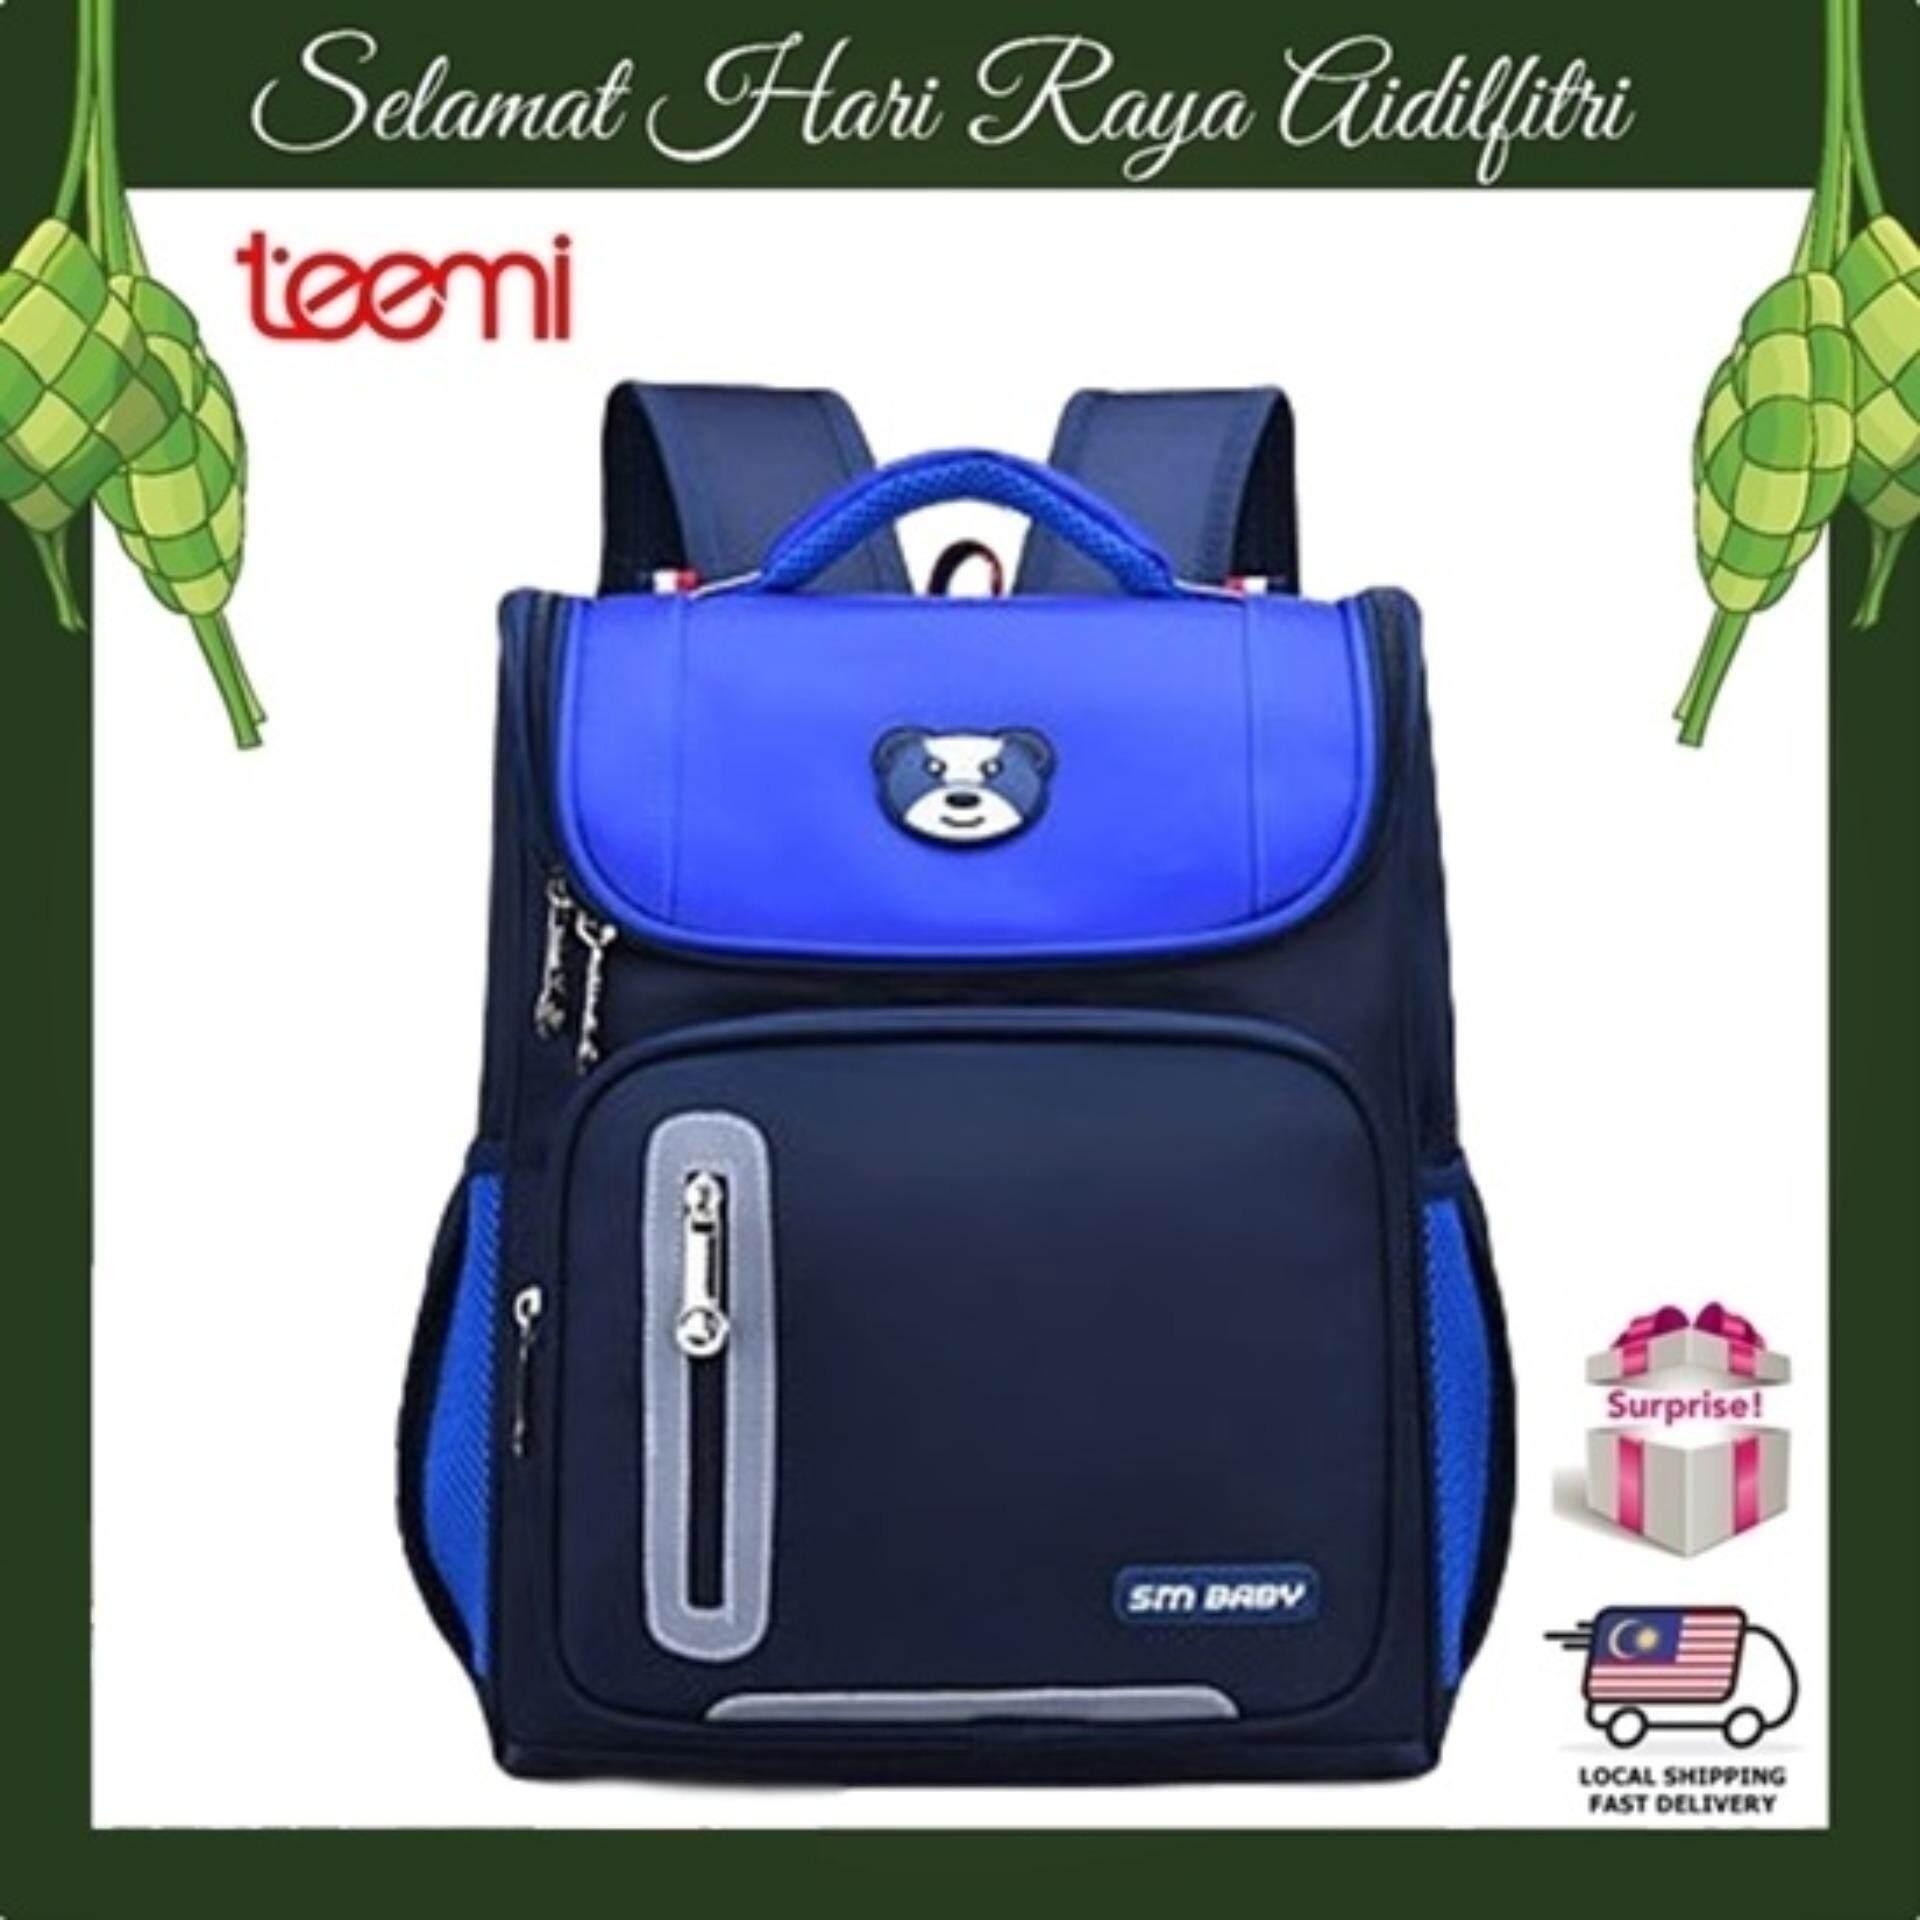 TEEMI Orthopedic Russian Backpack Top Load Water Resistant Star Bear Printing Light Weight Kids Children Primary School Bag